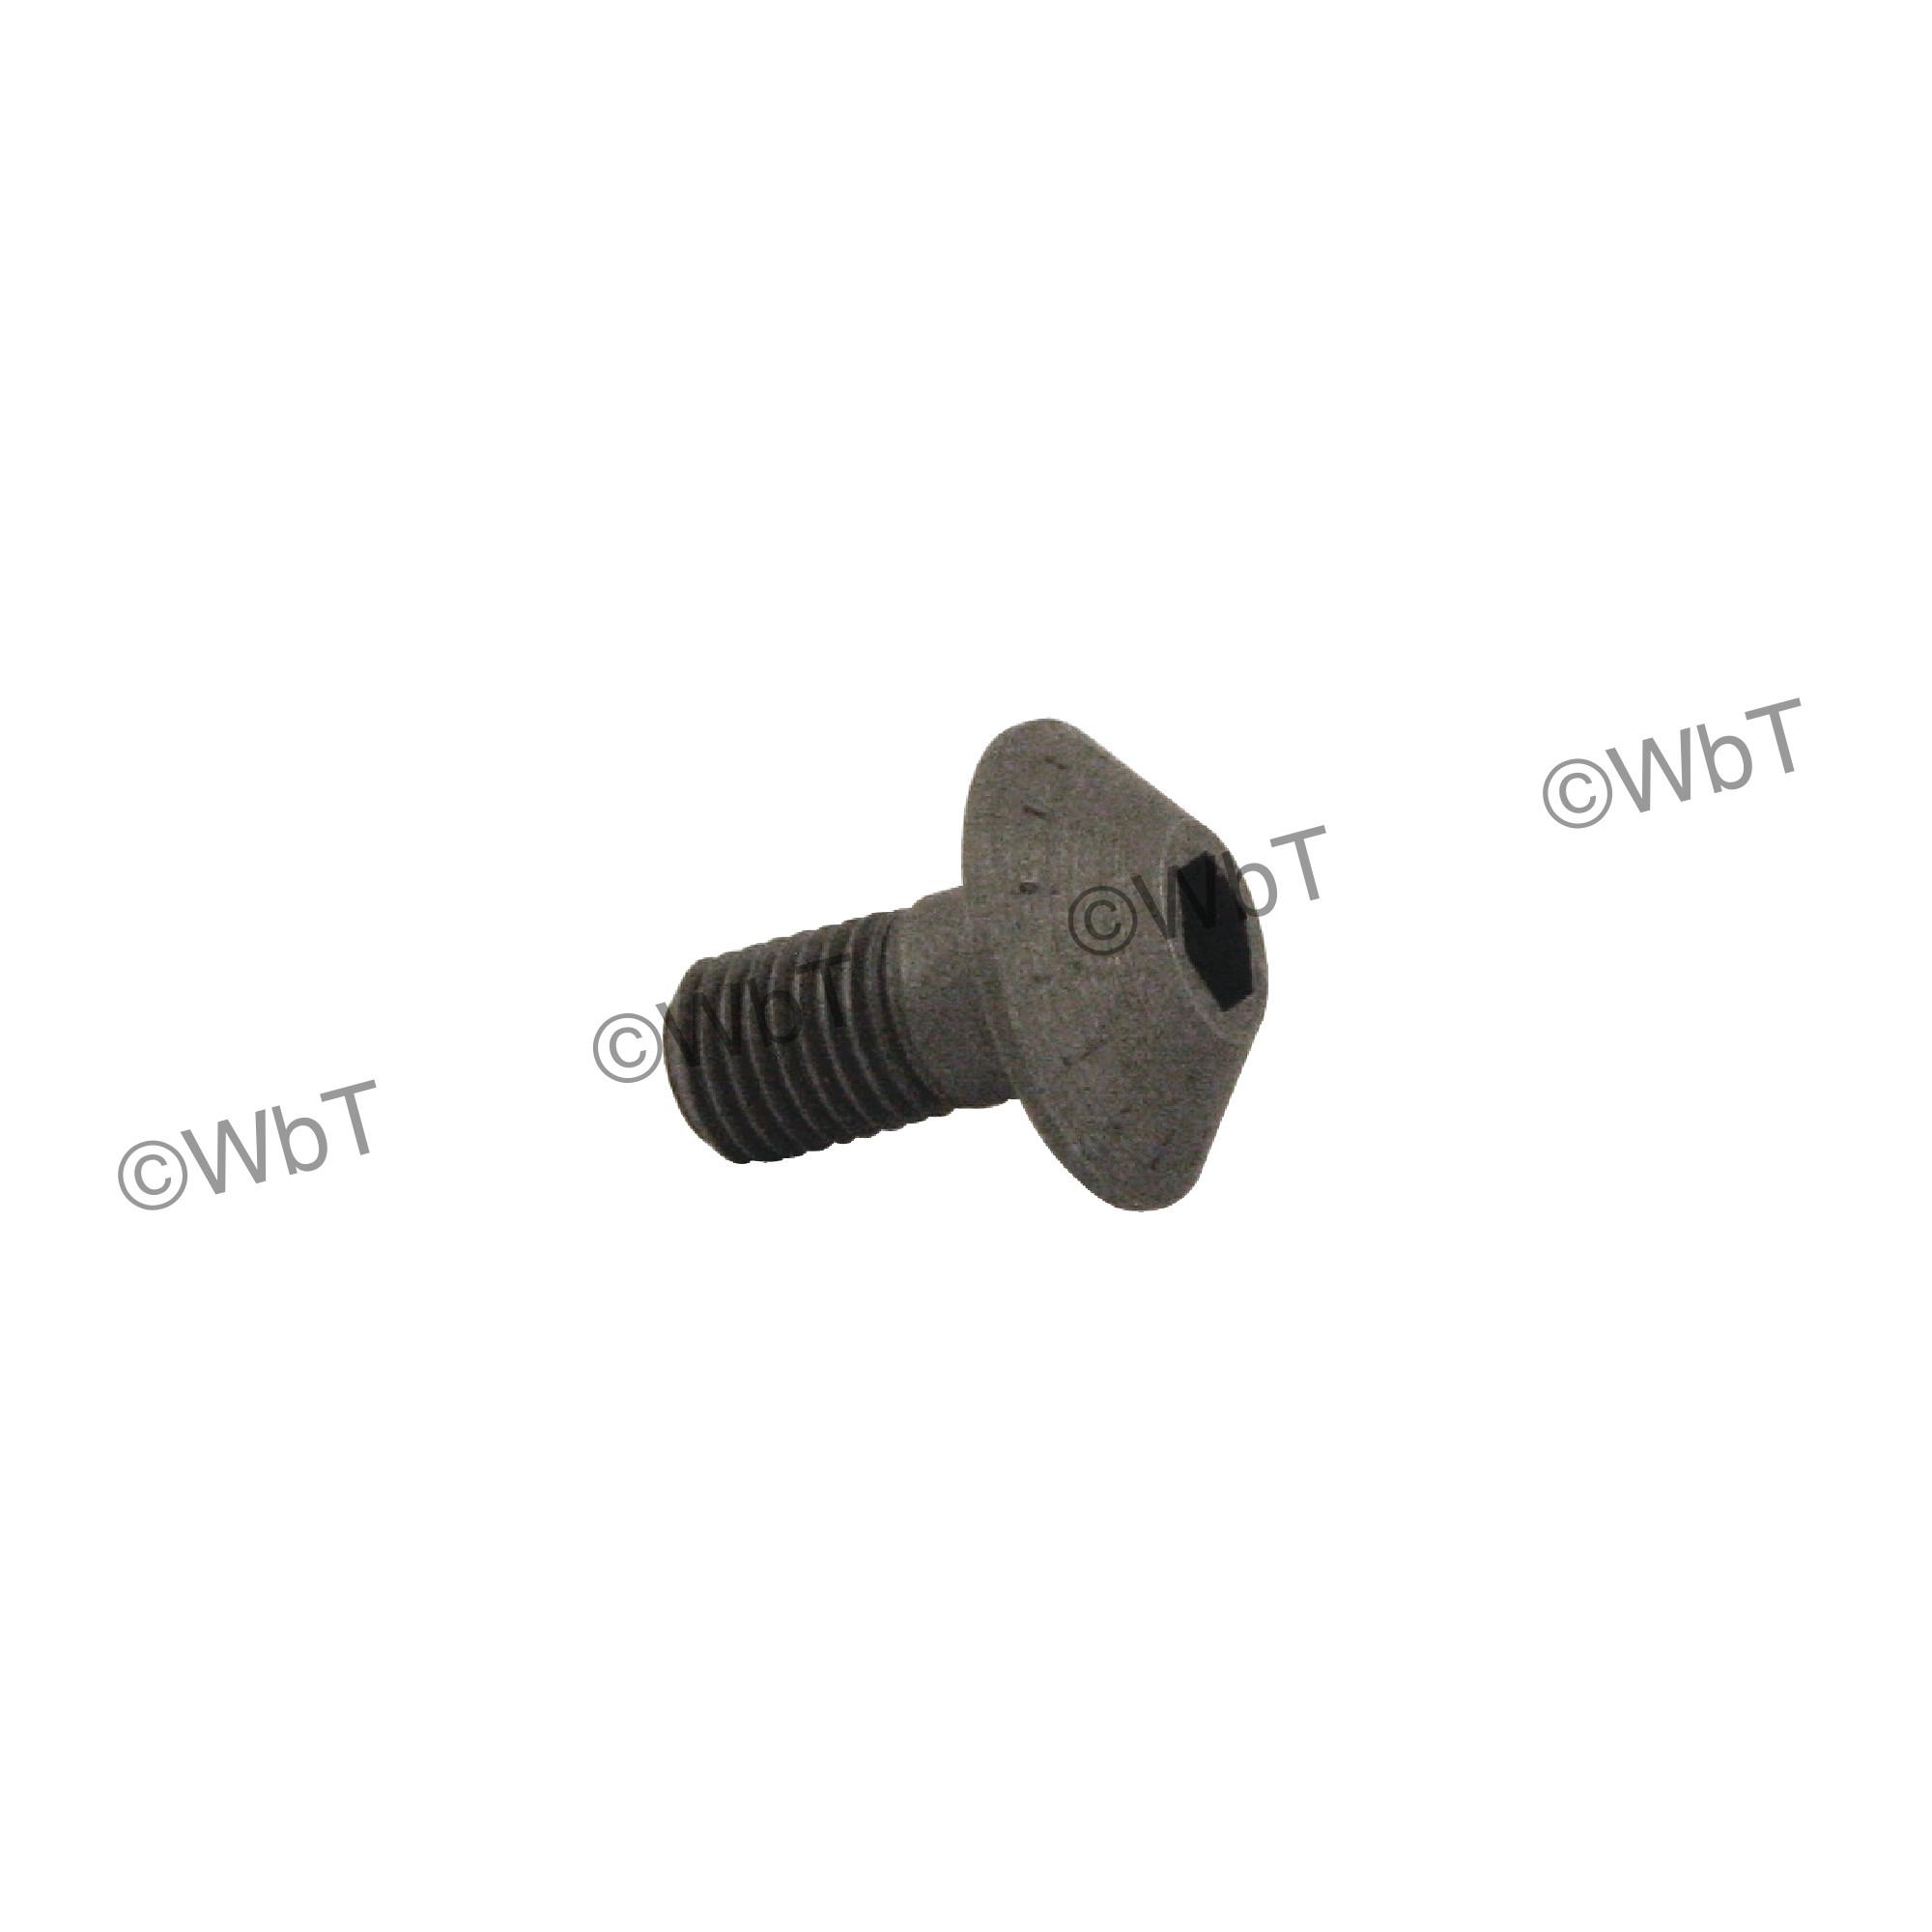 TTC PRODUCTION - 6-999-271 Socket Head Screw